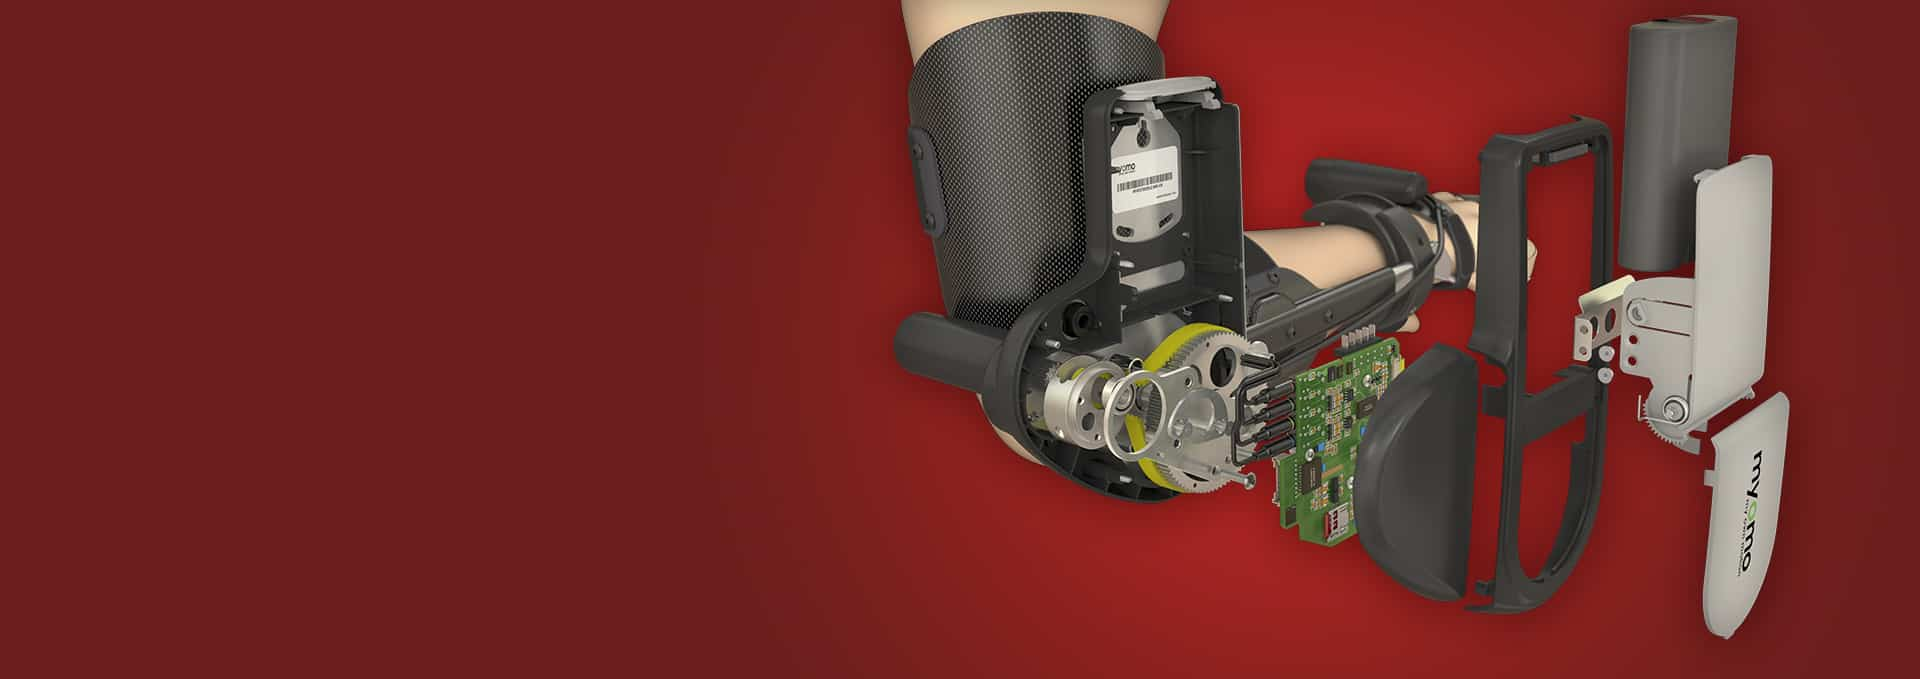 SolidWorks, 3D-skanneri. 3D-tulostin, koulutus, hinta